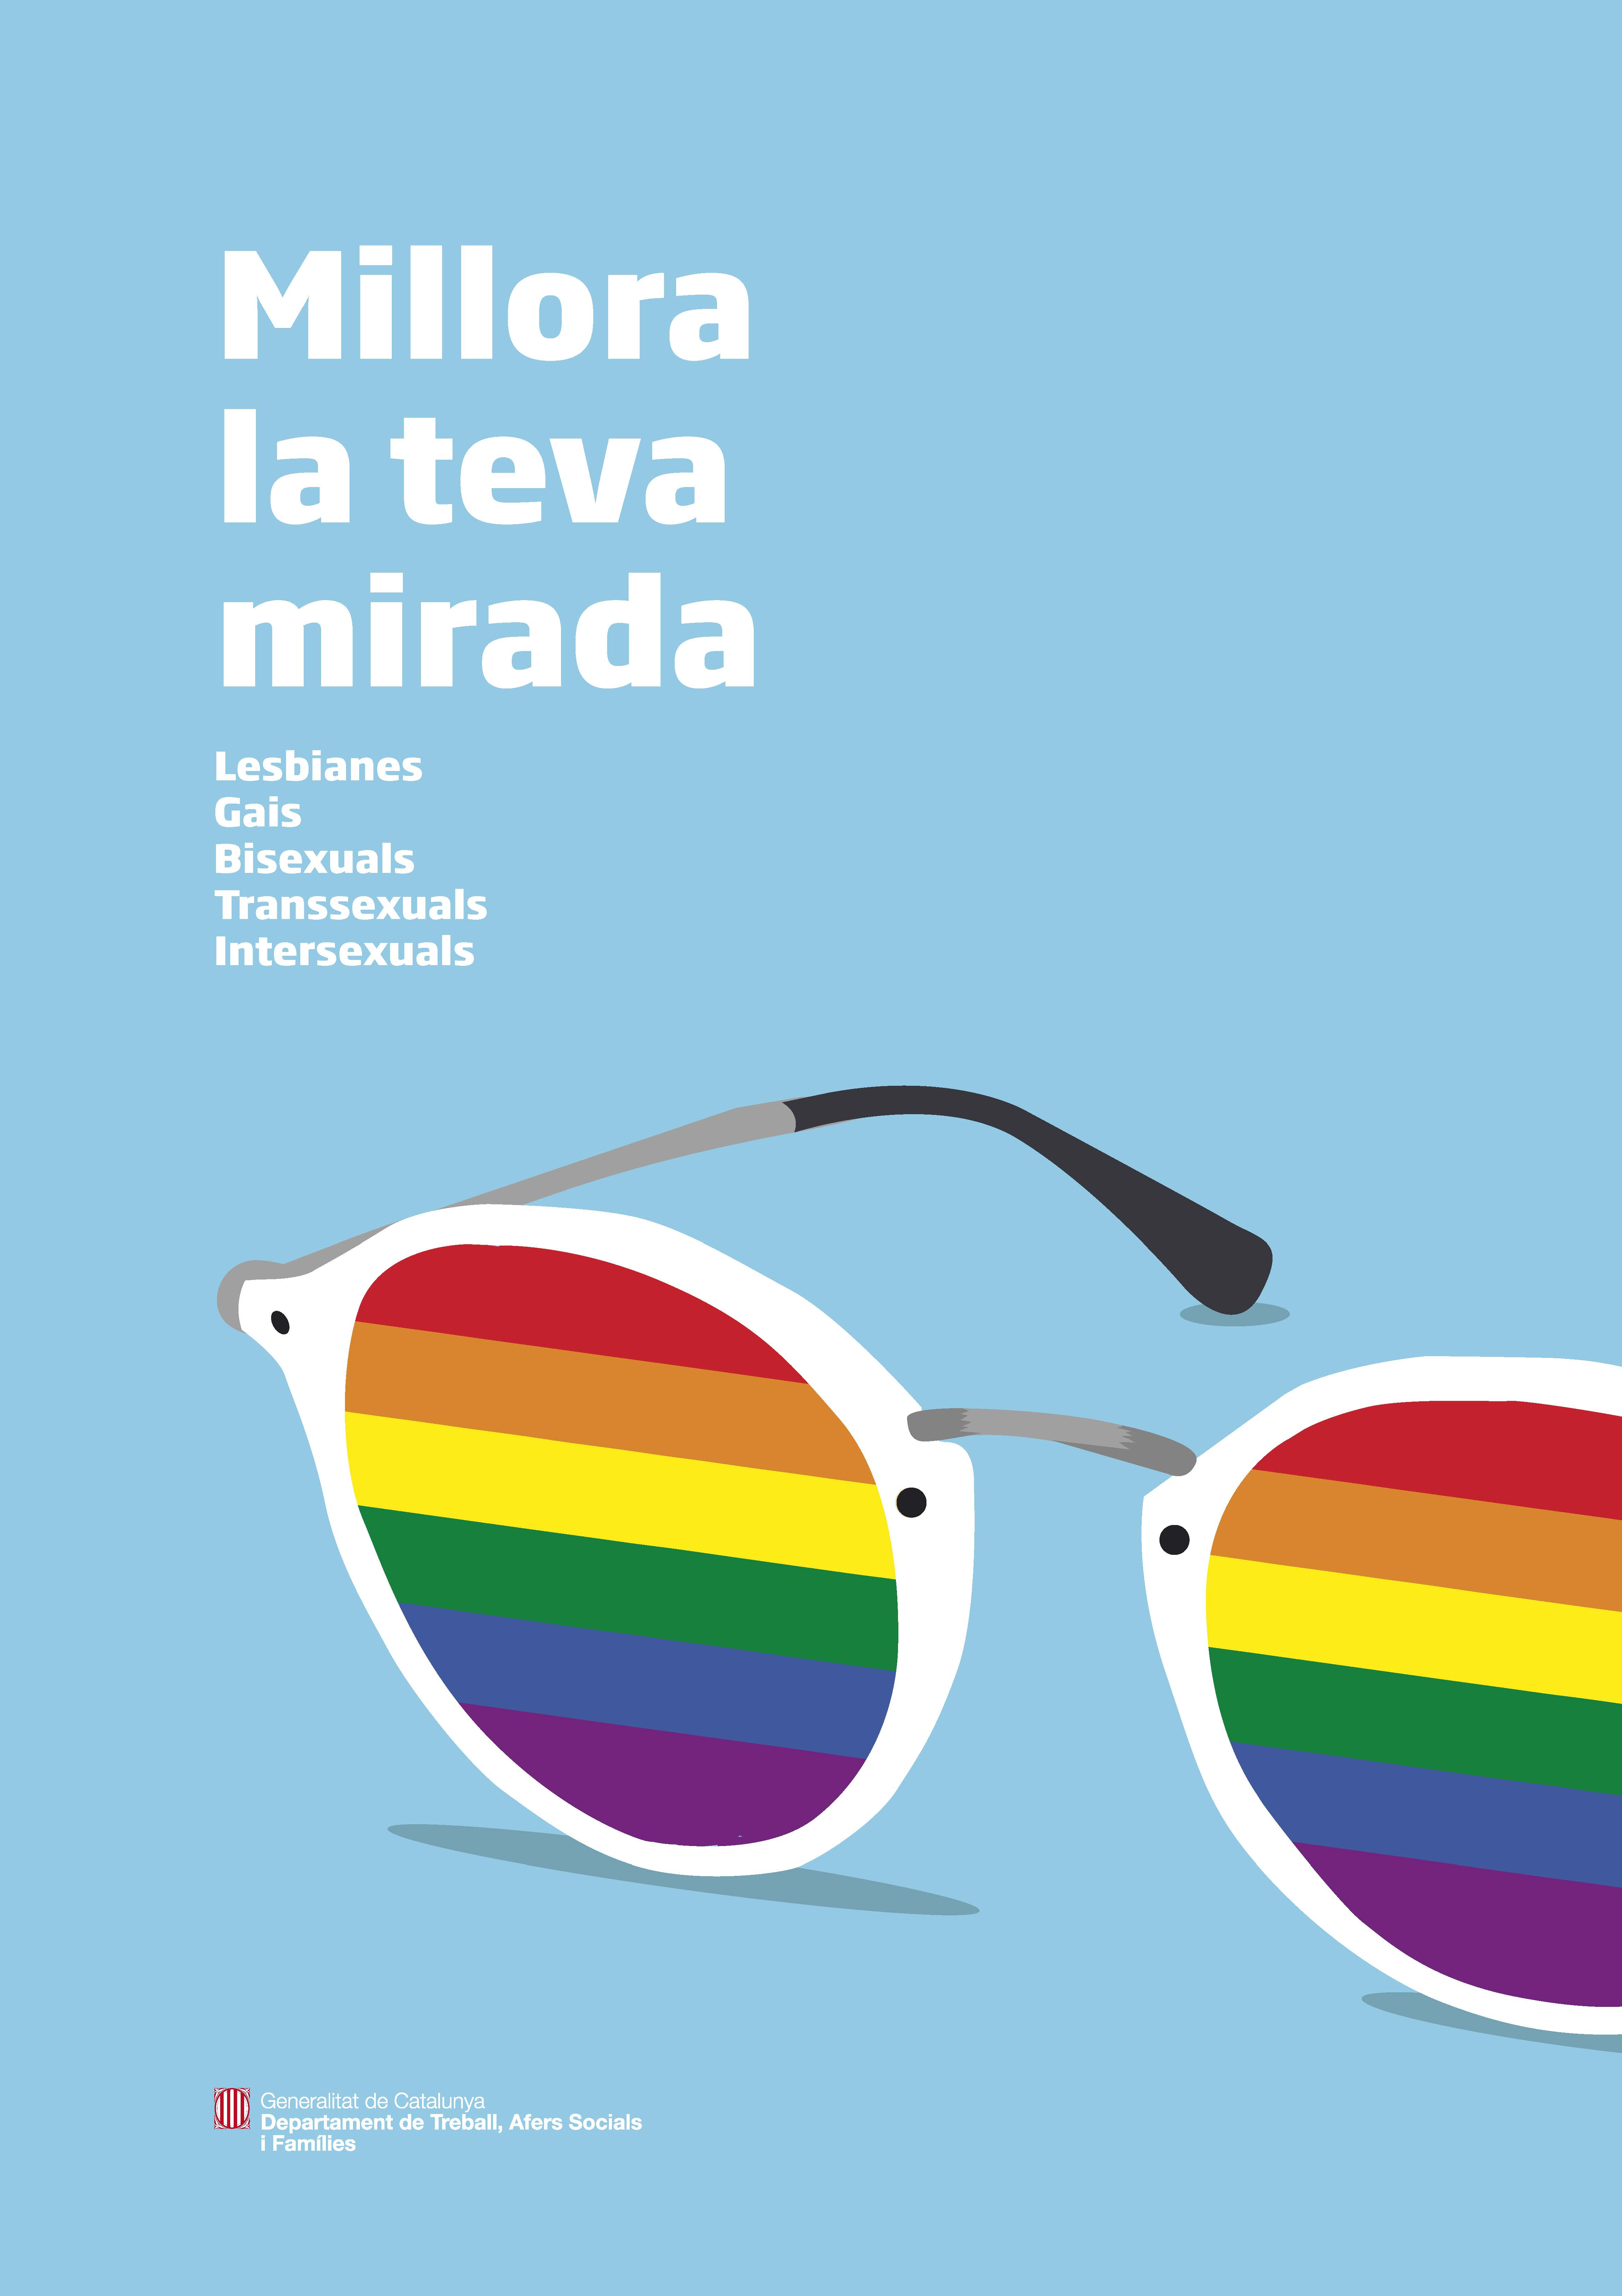 Millora la teva mirada by Maria Ventosa Fernández - Creative Work - $i